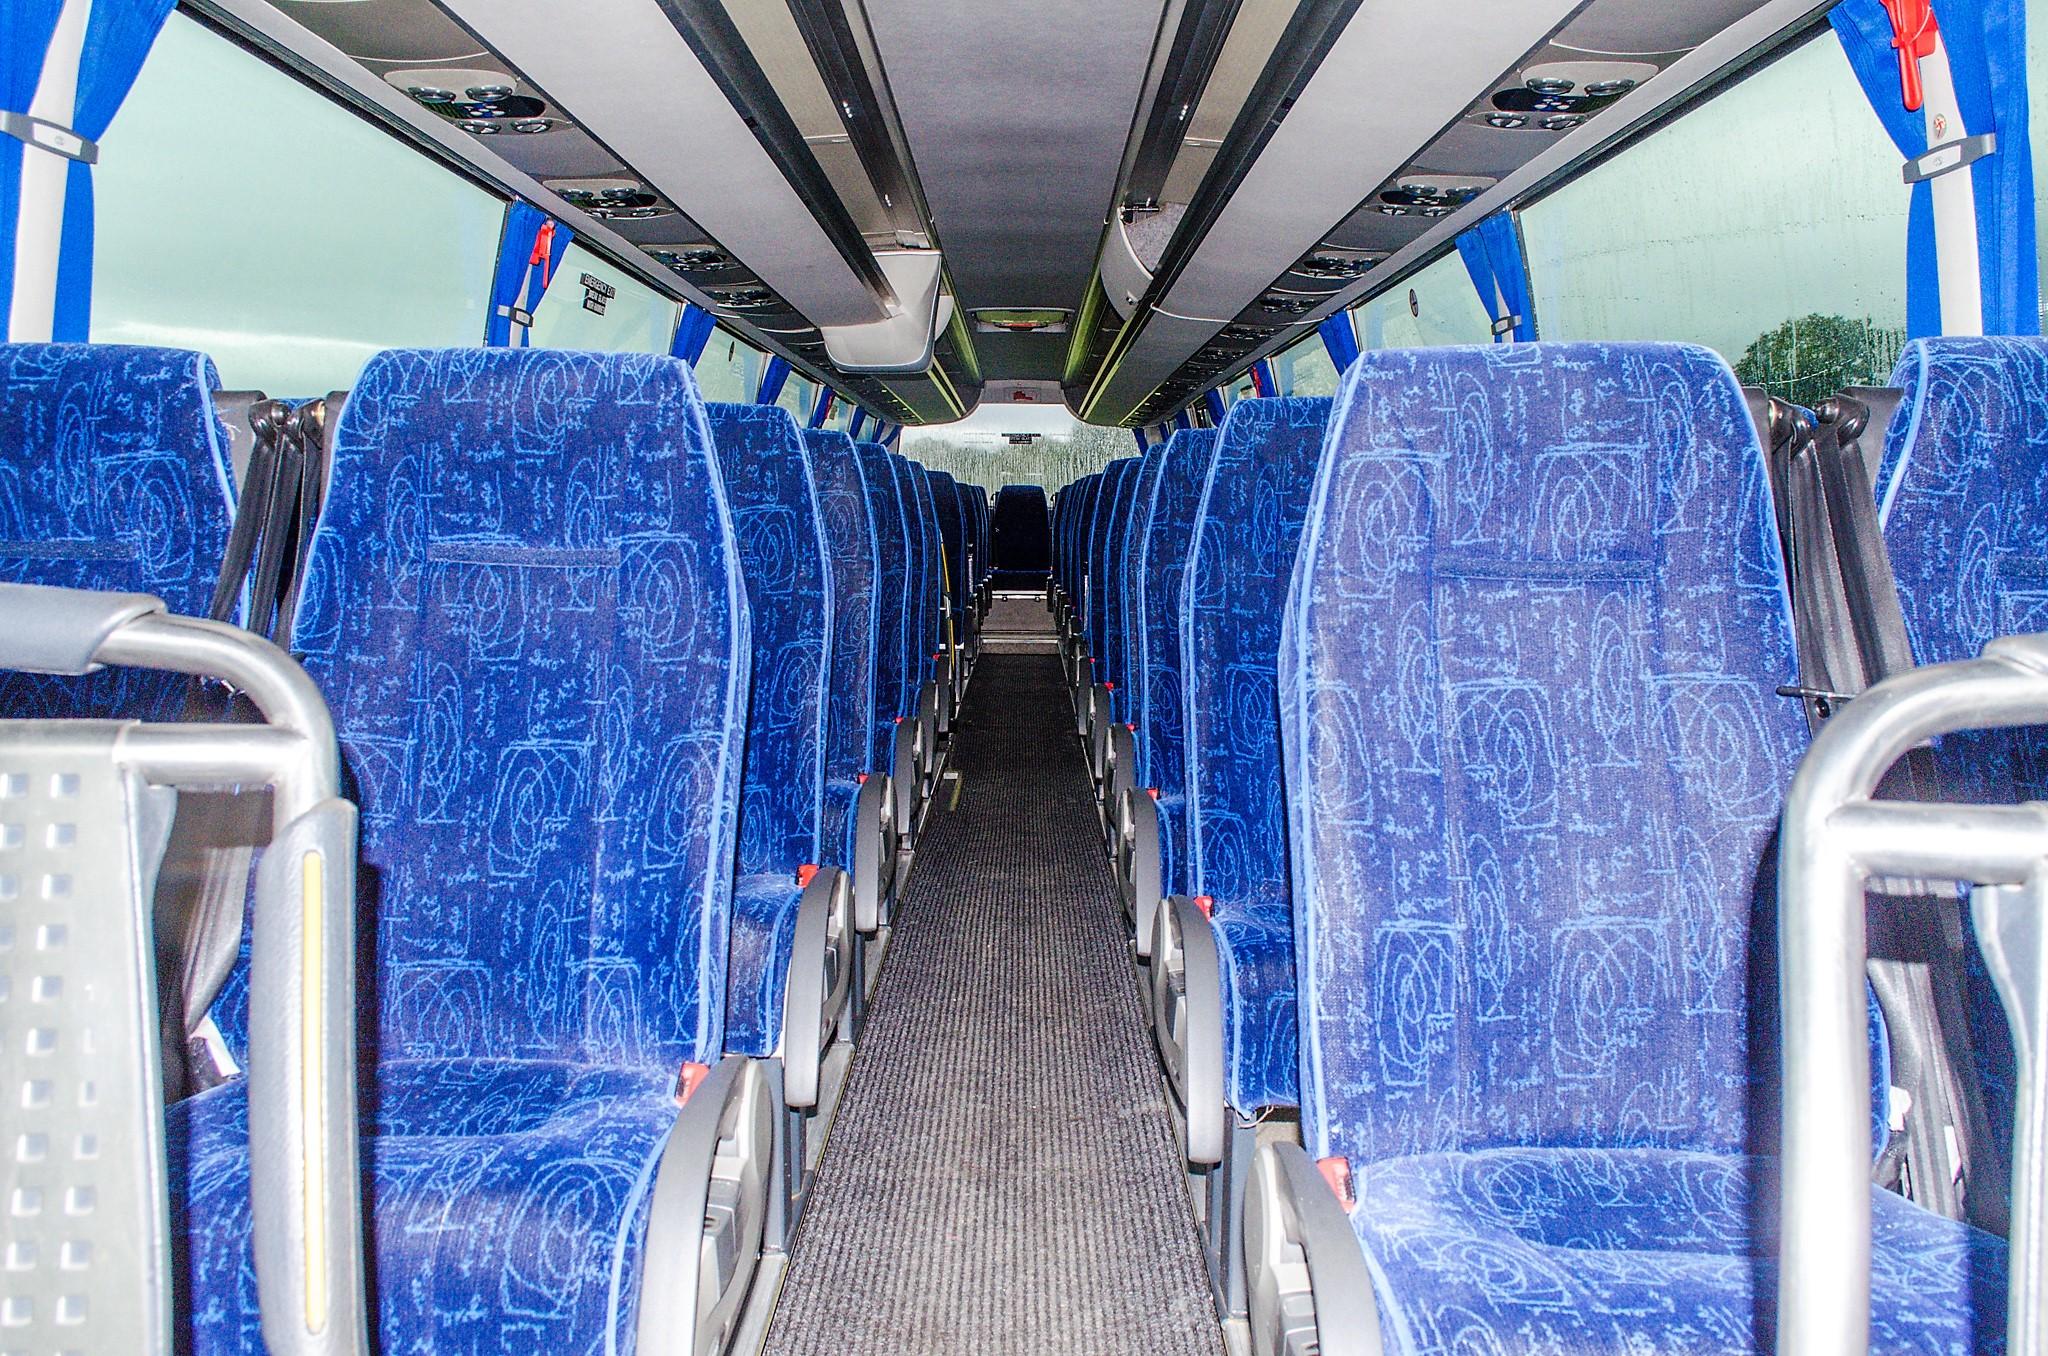 MAN F2000 Beulas Aura 54 seat luxury coach Registration Number: KC08 KTC Date of Registration: 30/ - Image 14 of 19